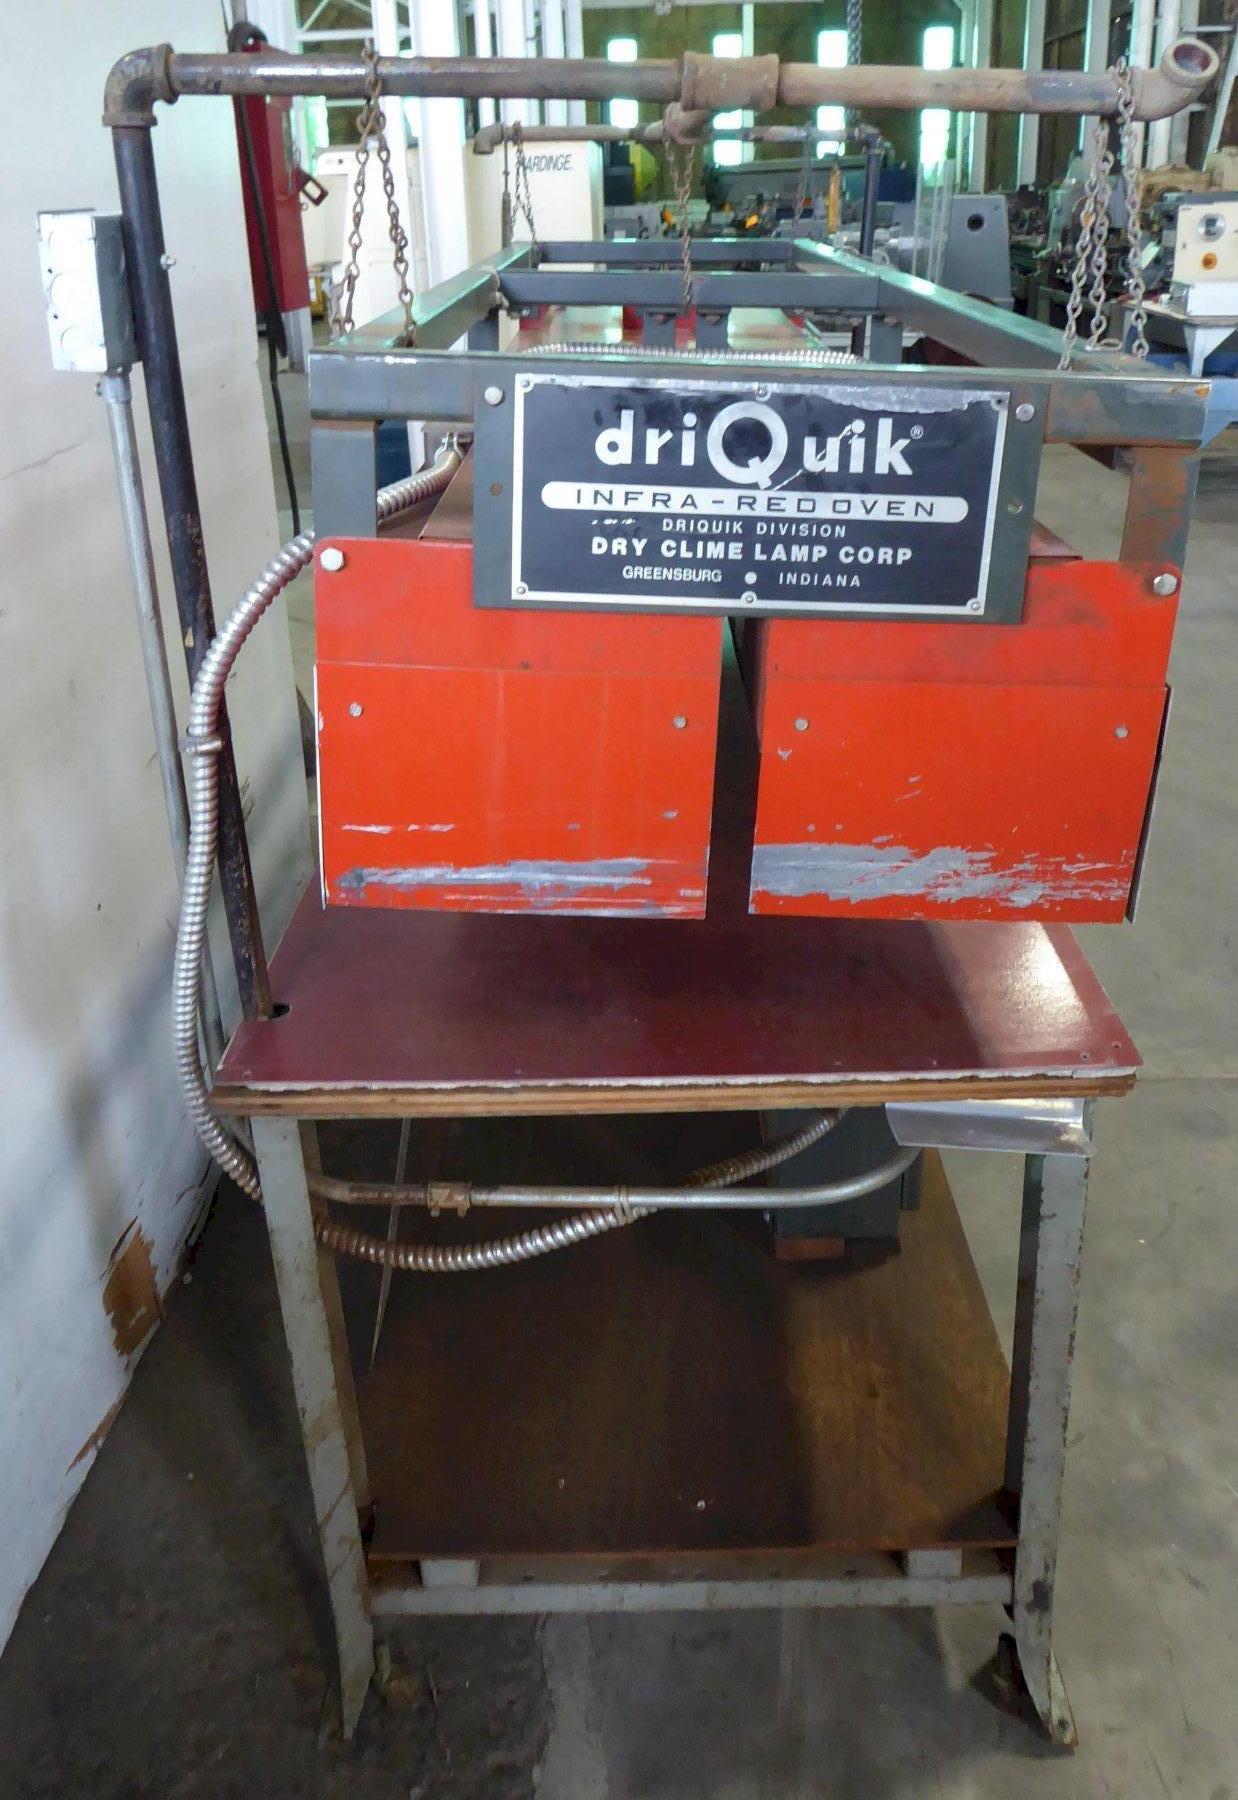 "driQuik Infra-Red Oven, (16 Generators), 22-1/2"" x 84-1/2"", 8 KW, 240 Volt 3 Phase, Temp. Controller"